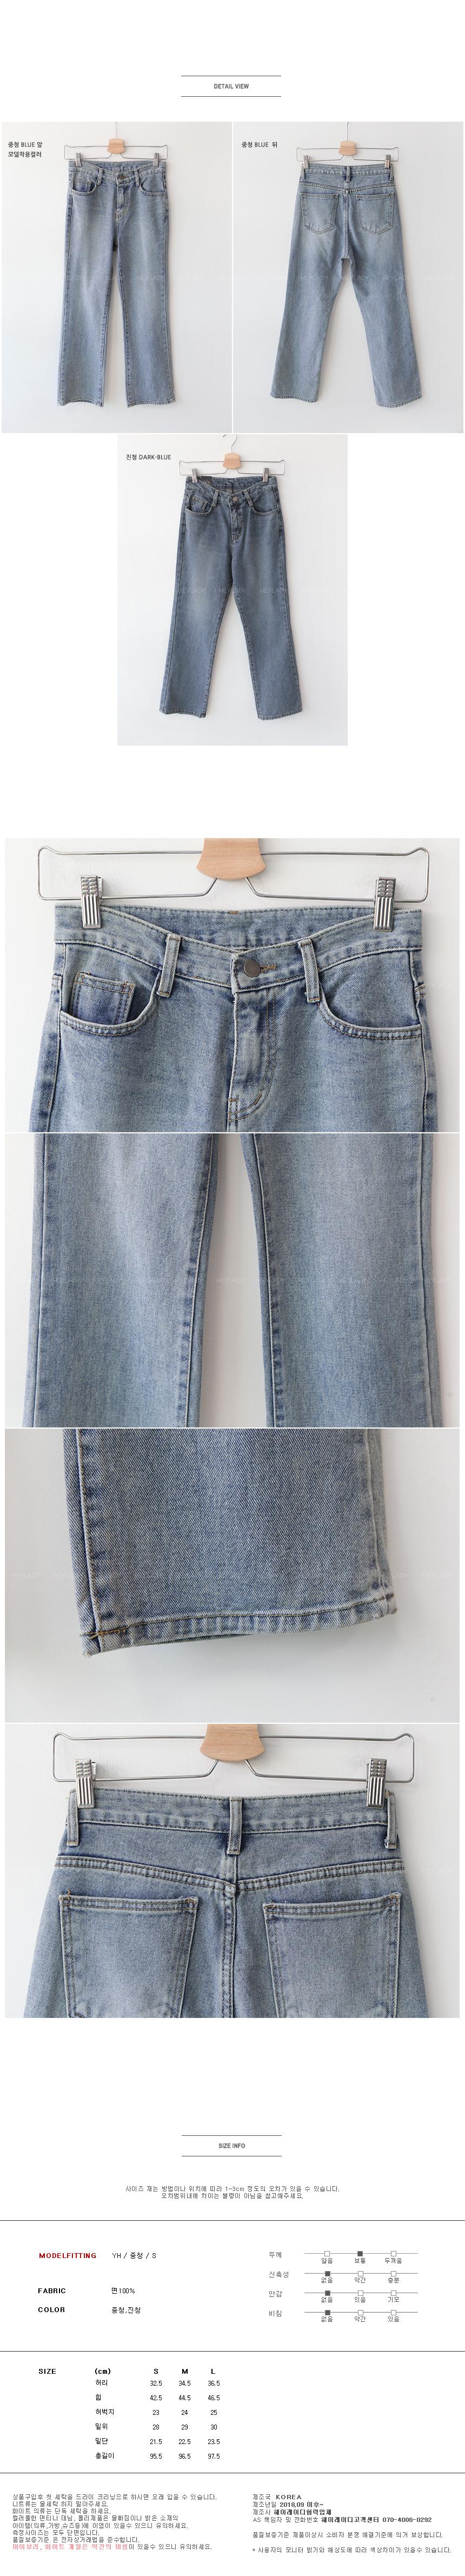 Purine Wide Denim Pants